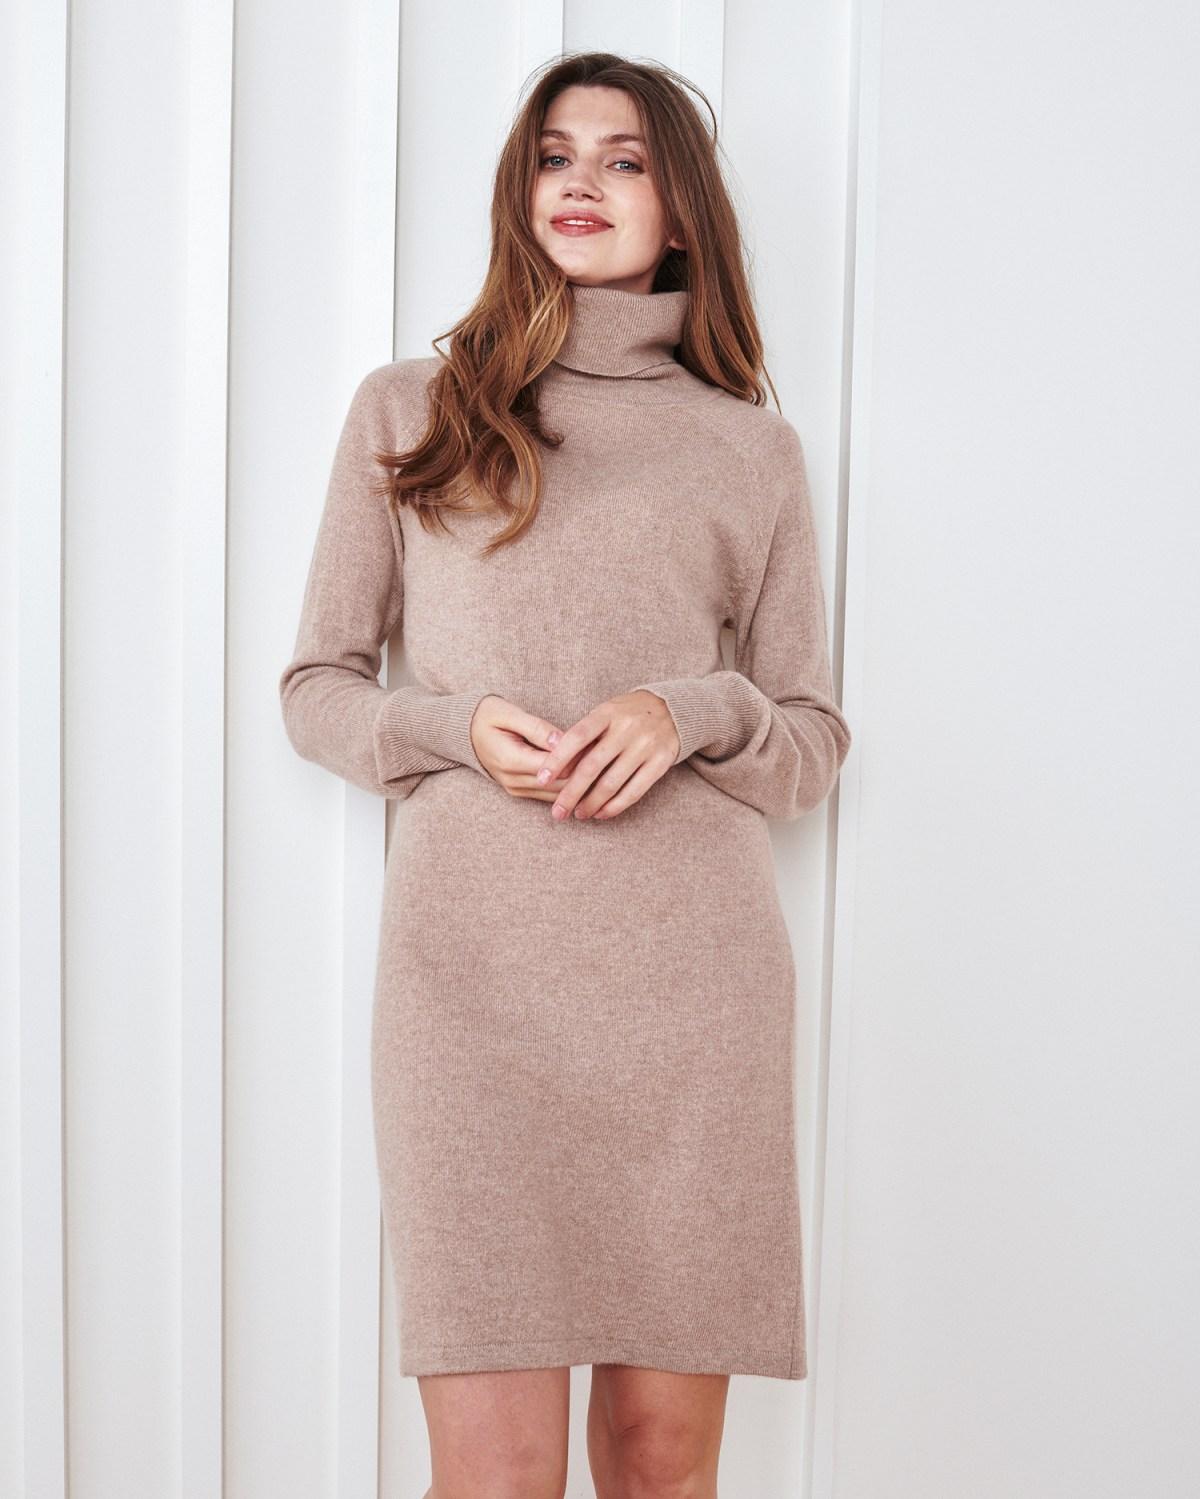 Woman wearing cashmere turtleneck sweater dress